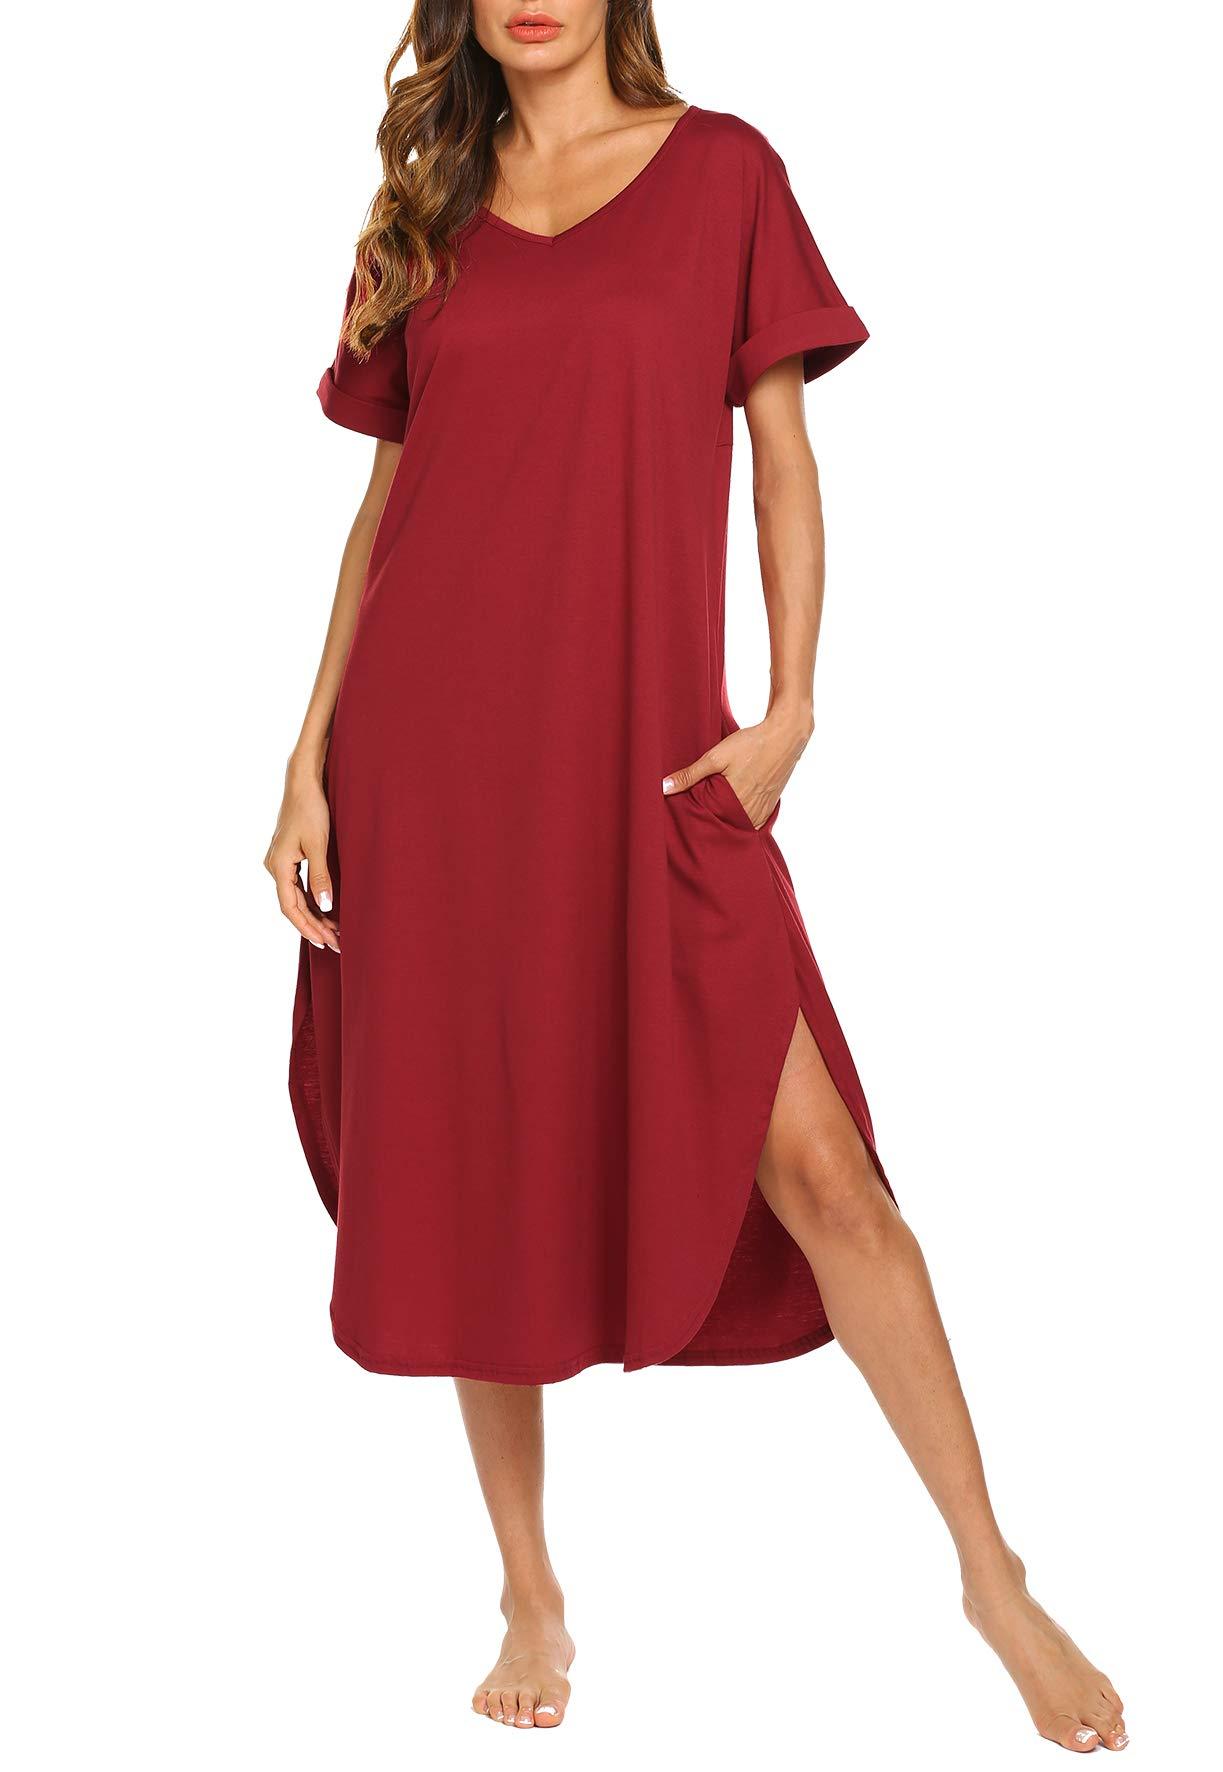 Aviier Long Nightgown with Side Pockets V Neck Short Sleeve Maxi Sleepshirt Ultra Soft (red, XXL)